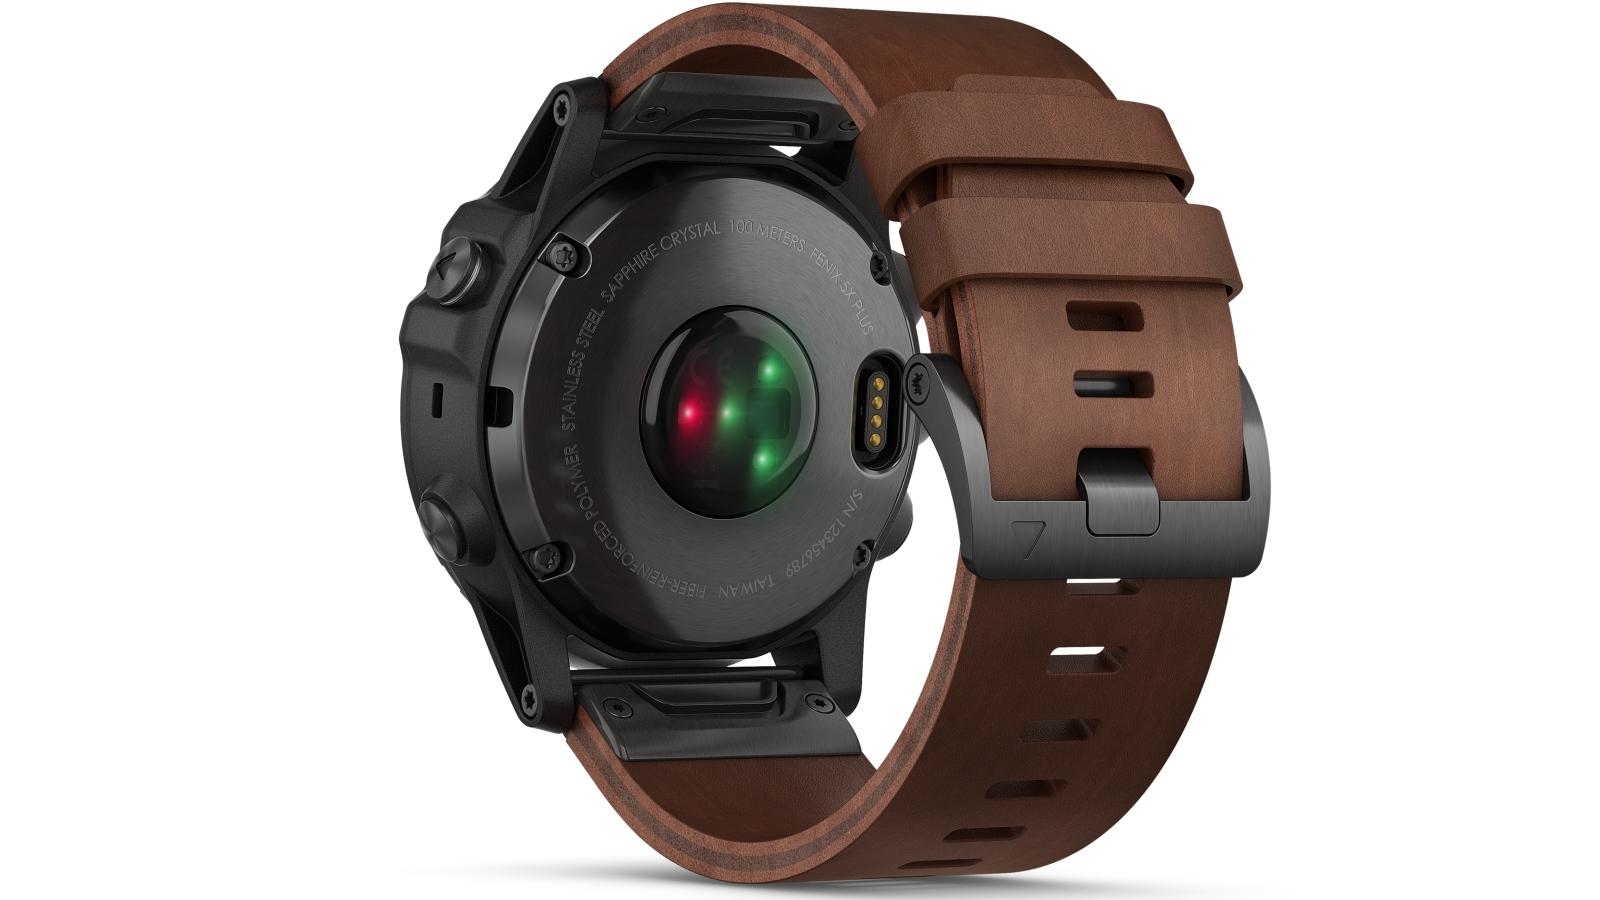 Garmin Fenix 5x Plus Sapphire Edition Gps Smart Watch Slate Grey Case With Brown Leather Band